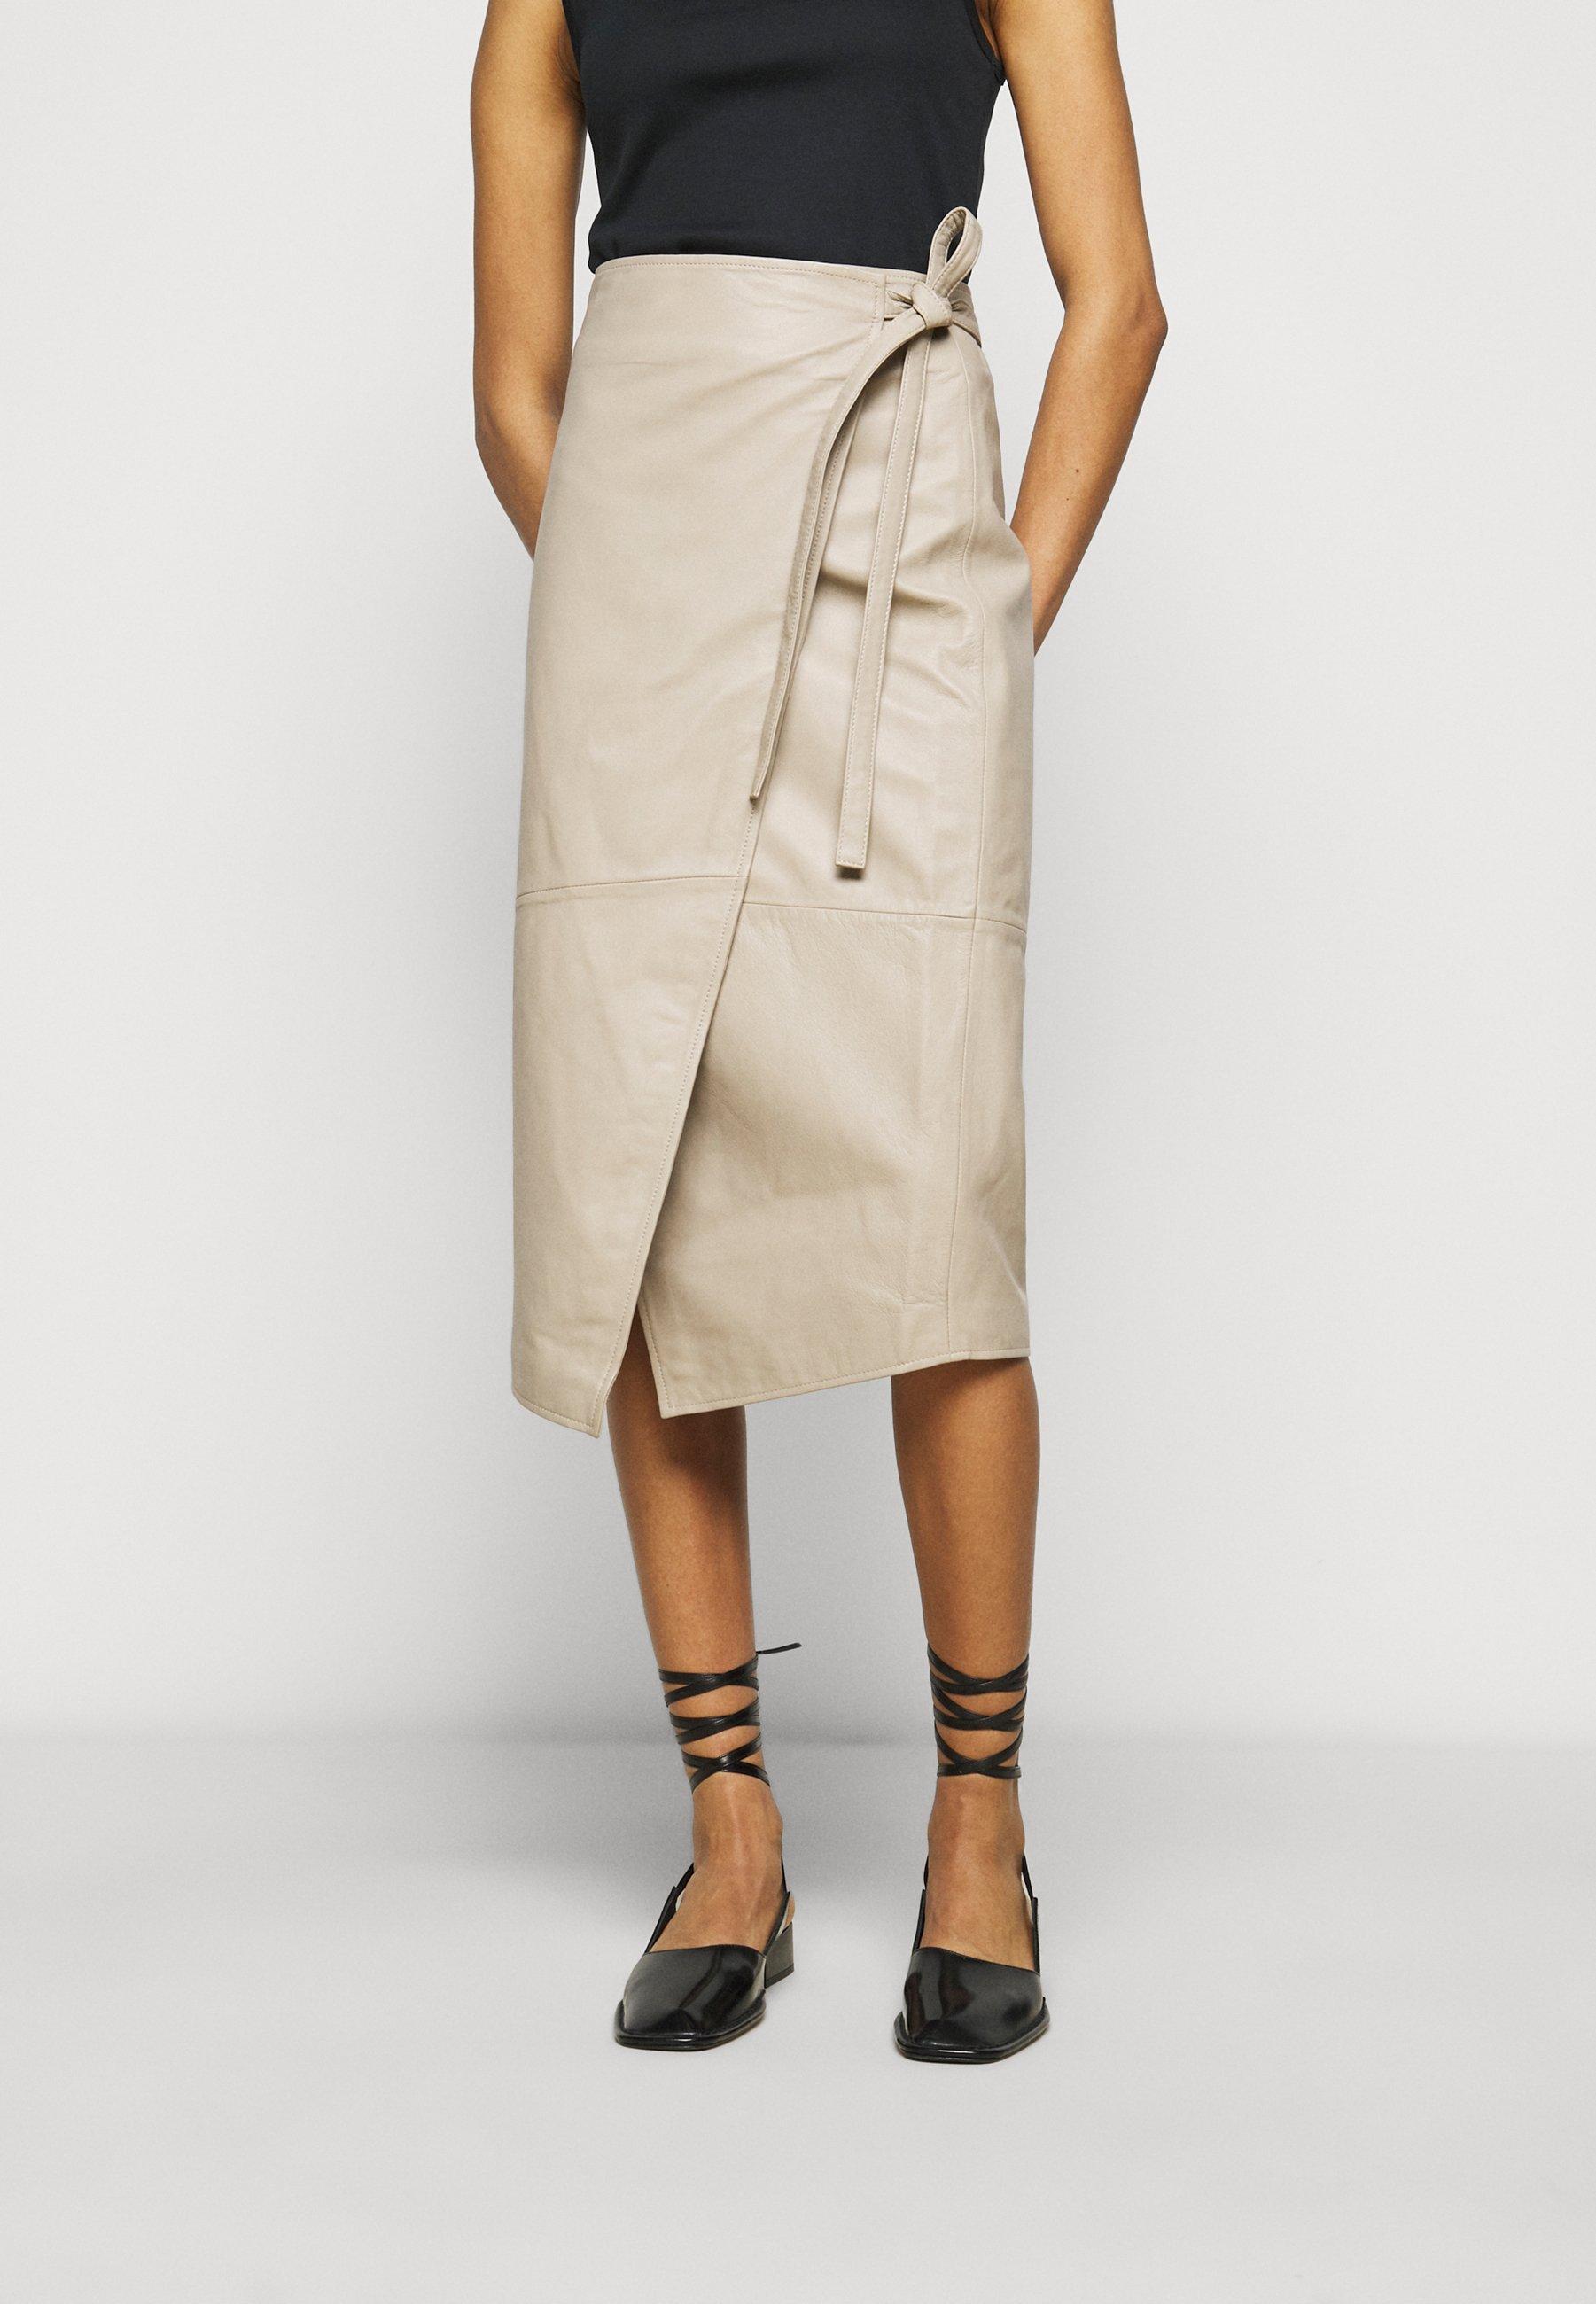 Femme MURPHY - Jupe en cuir